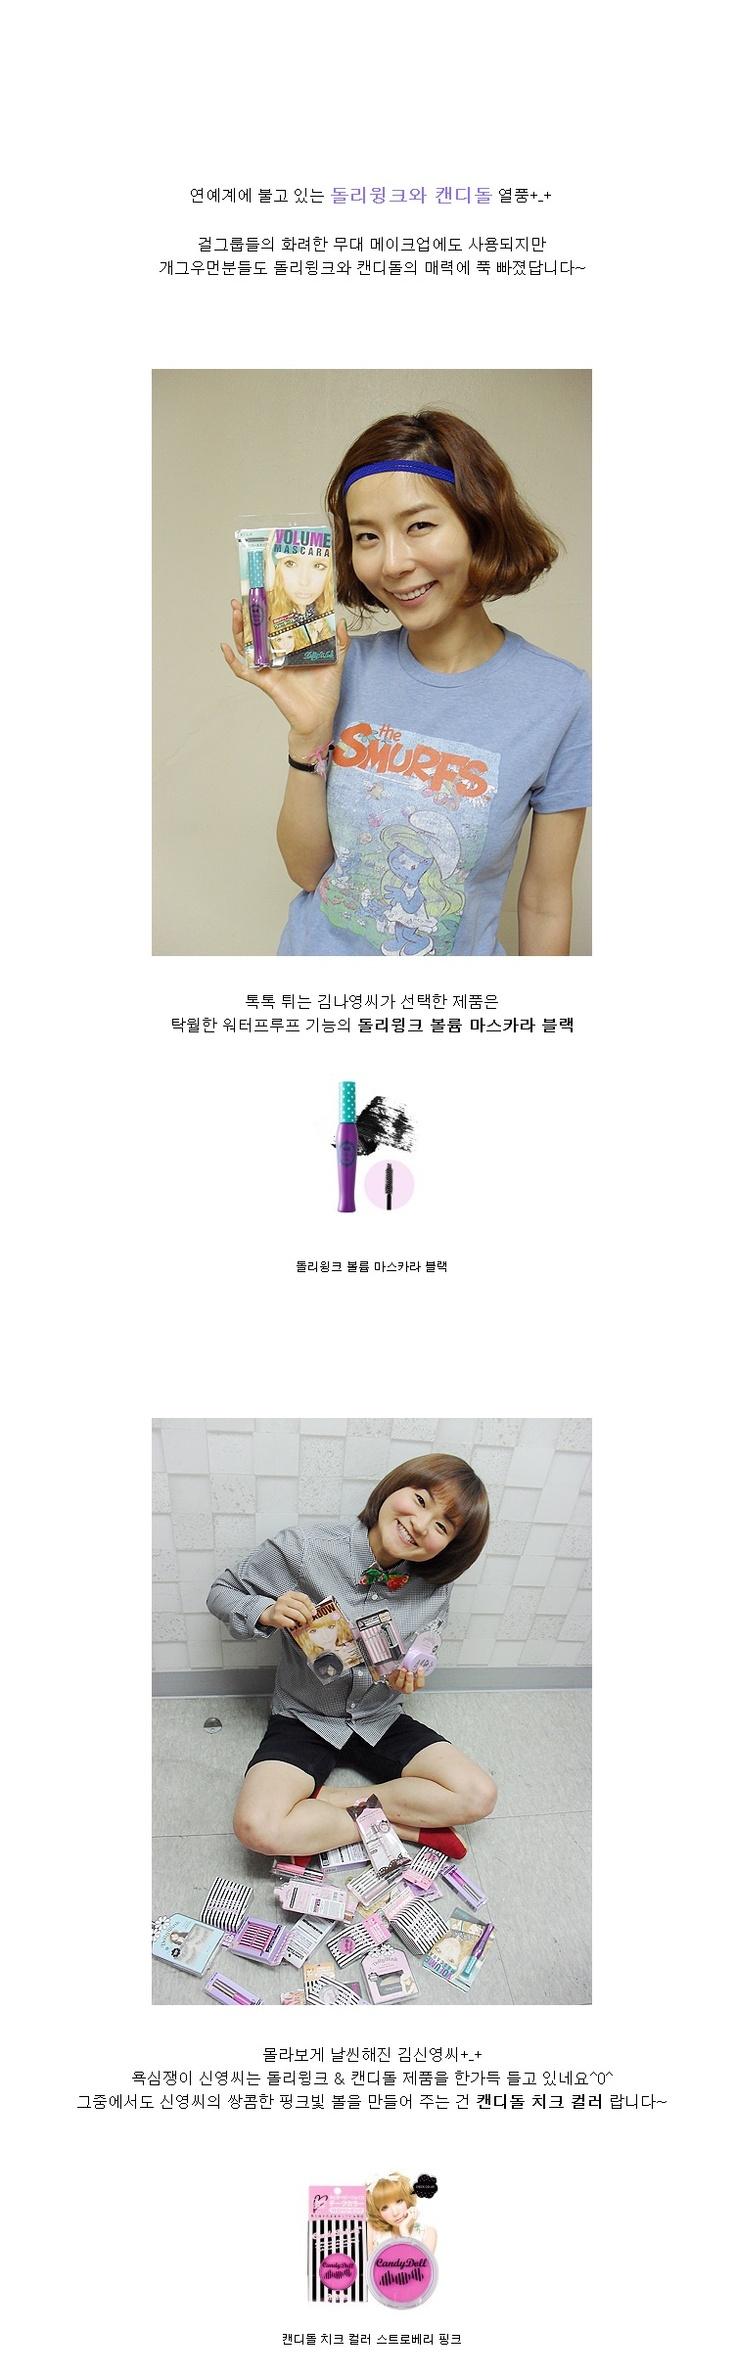 Celebrity Sponsorship - Gim SinYoung, Gim NaYoung